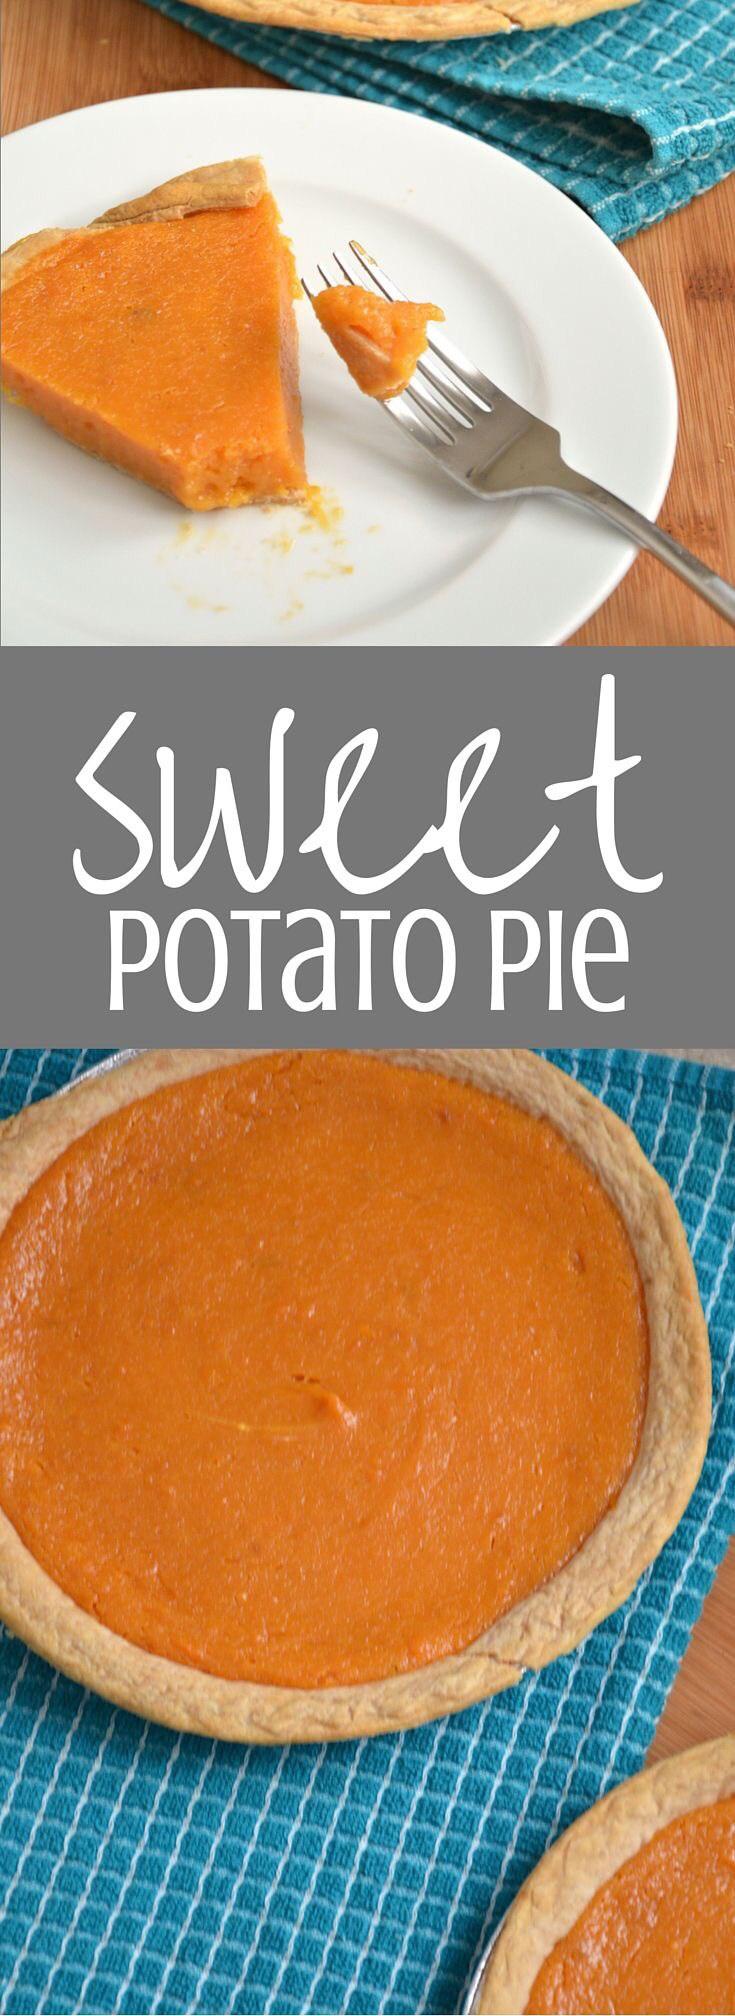 Sweet-Potato-Pie-recepie.jpg